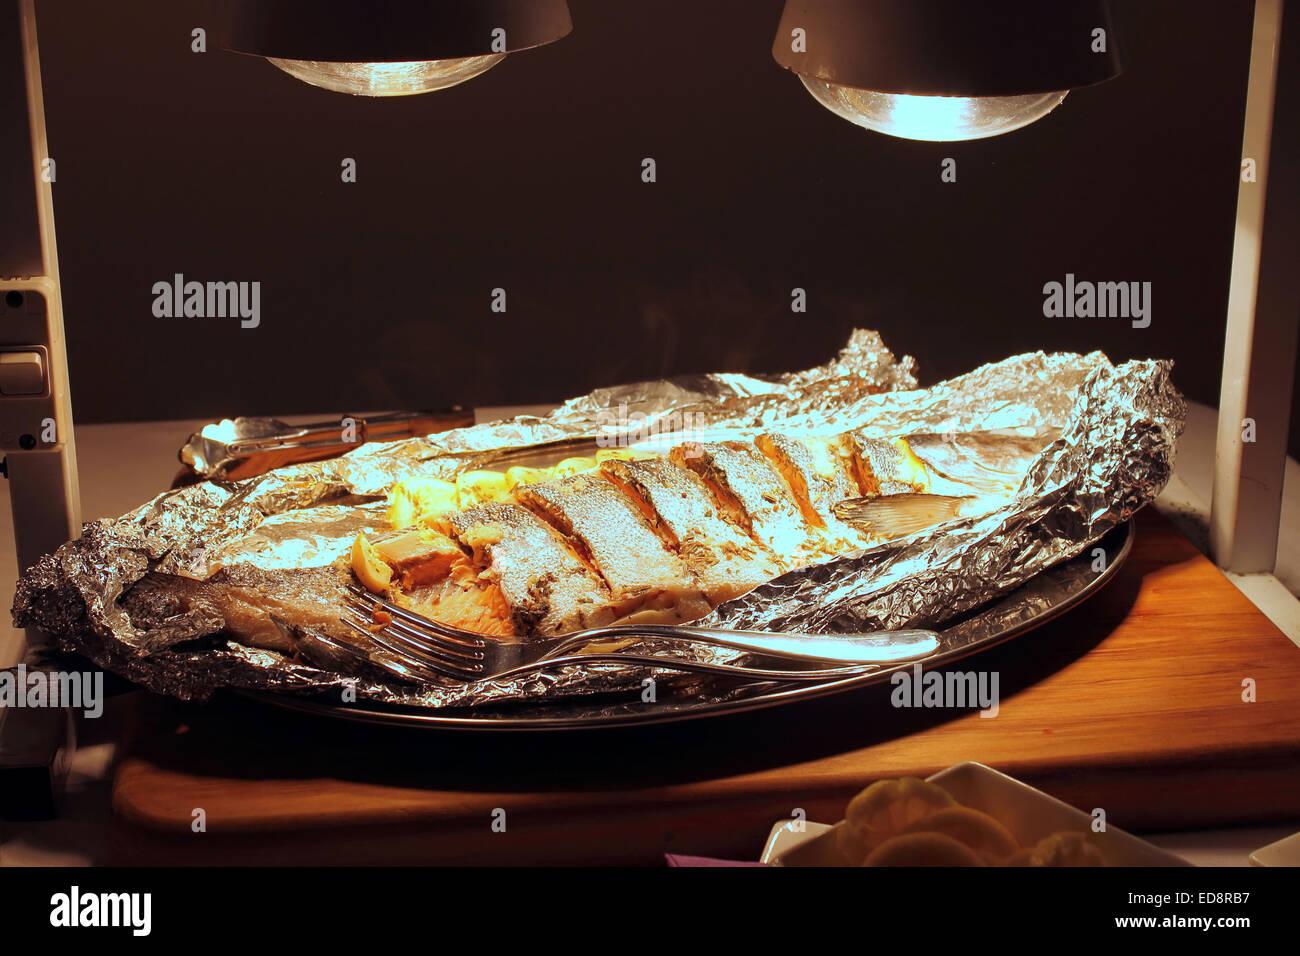 Baked Salmon - Stock Image